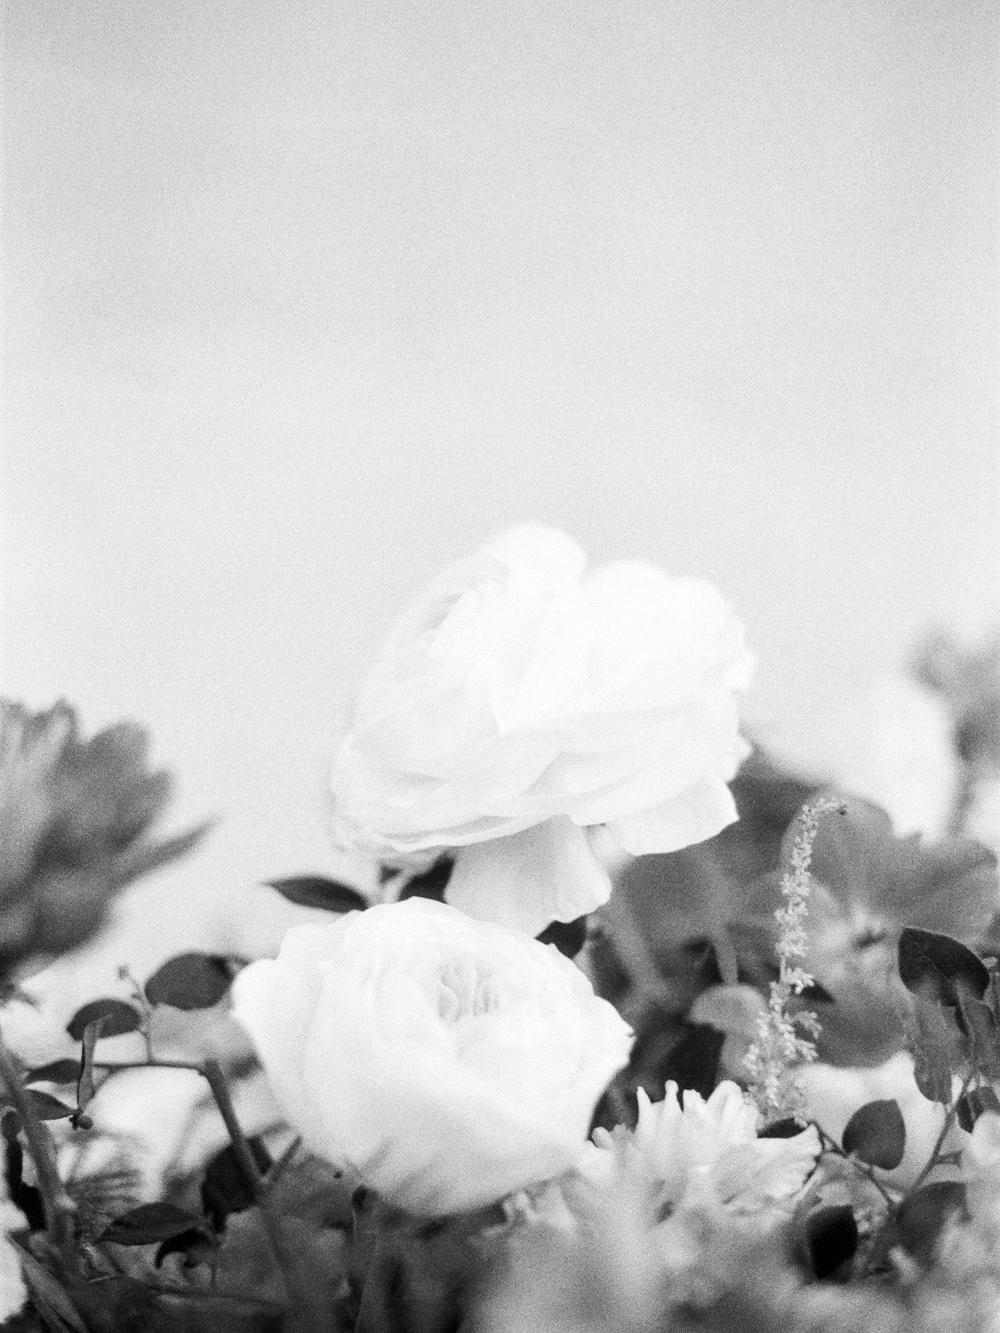 Christine Gosch - destination film photographer - houston wedding photographer - fine art film photographer - elopement photographer - destination wedding - understated wedding - simple beautiful wedding photography-23.jpg